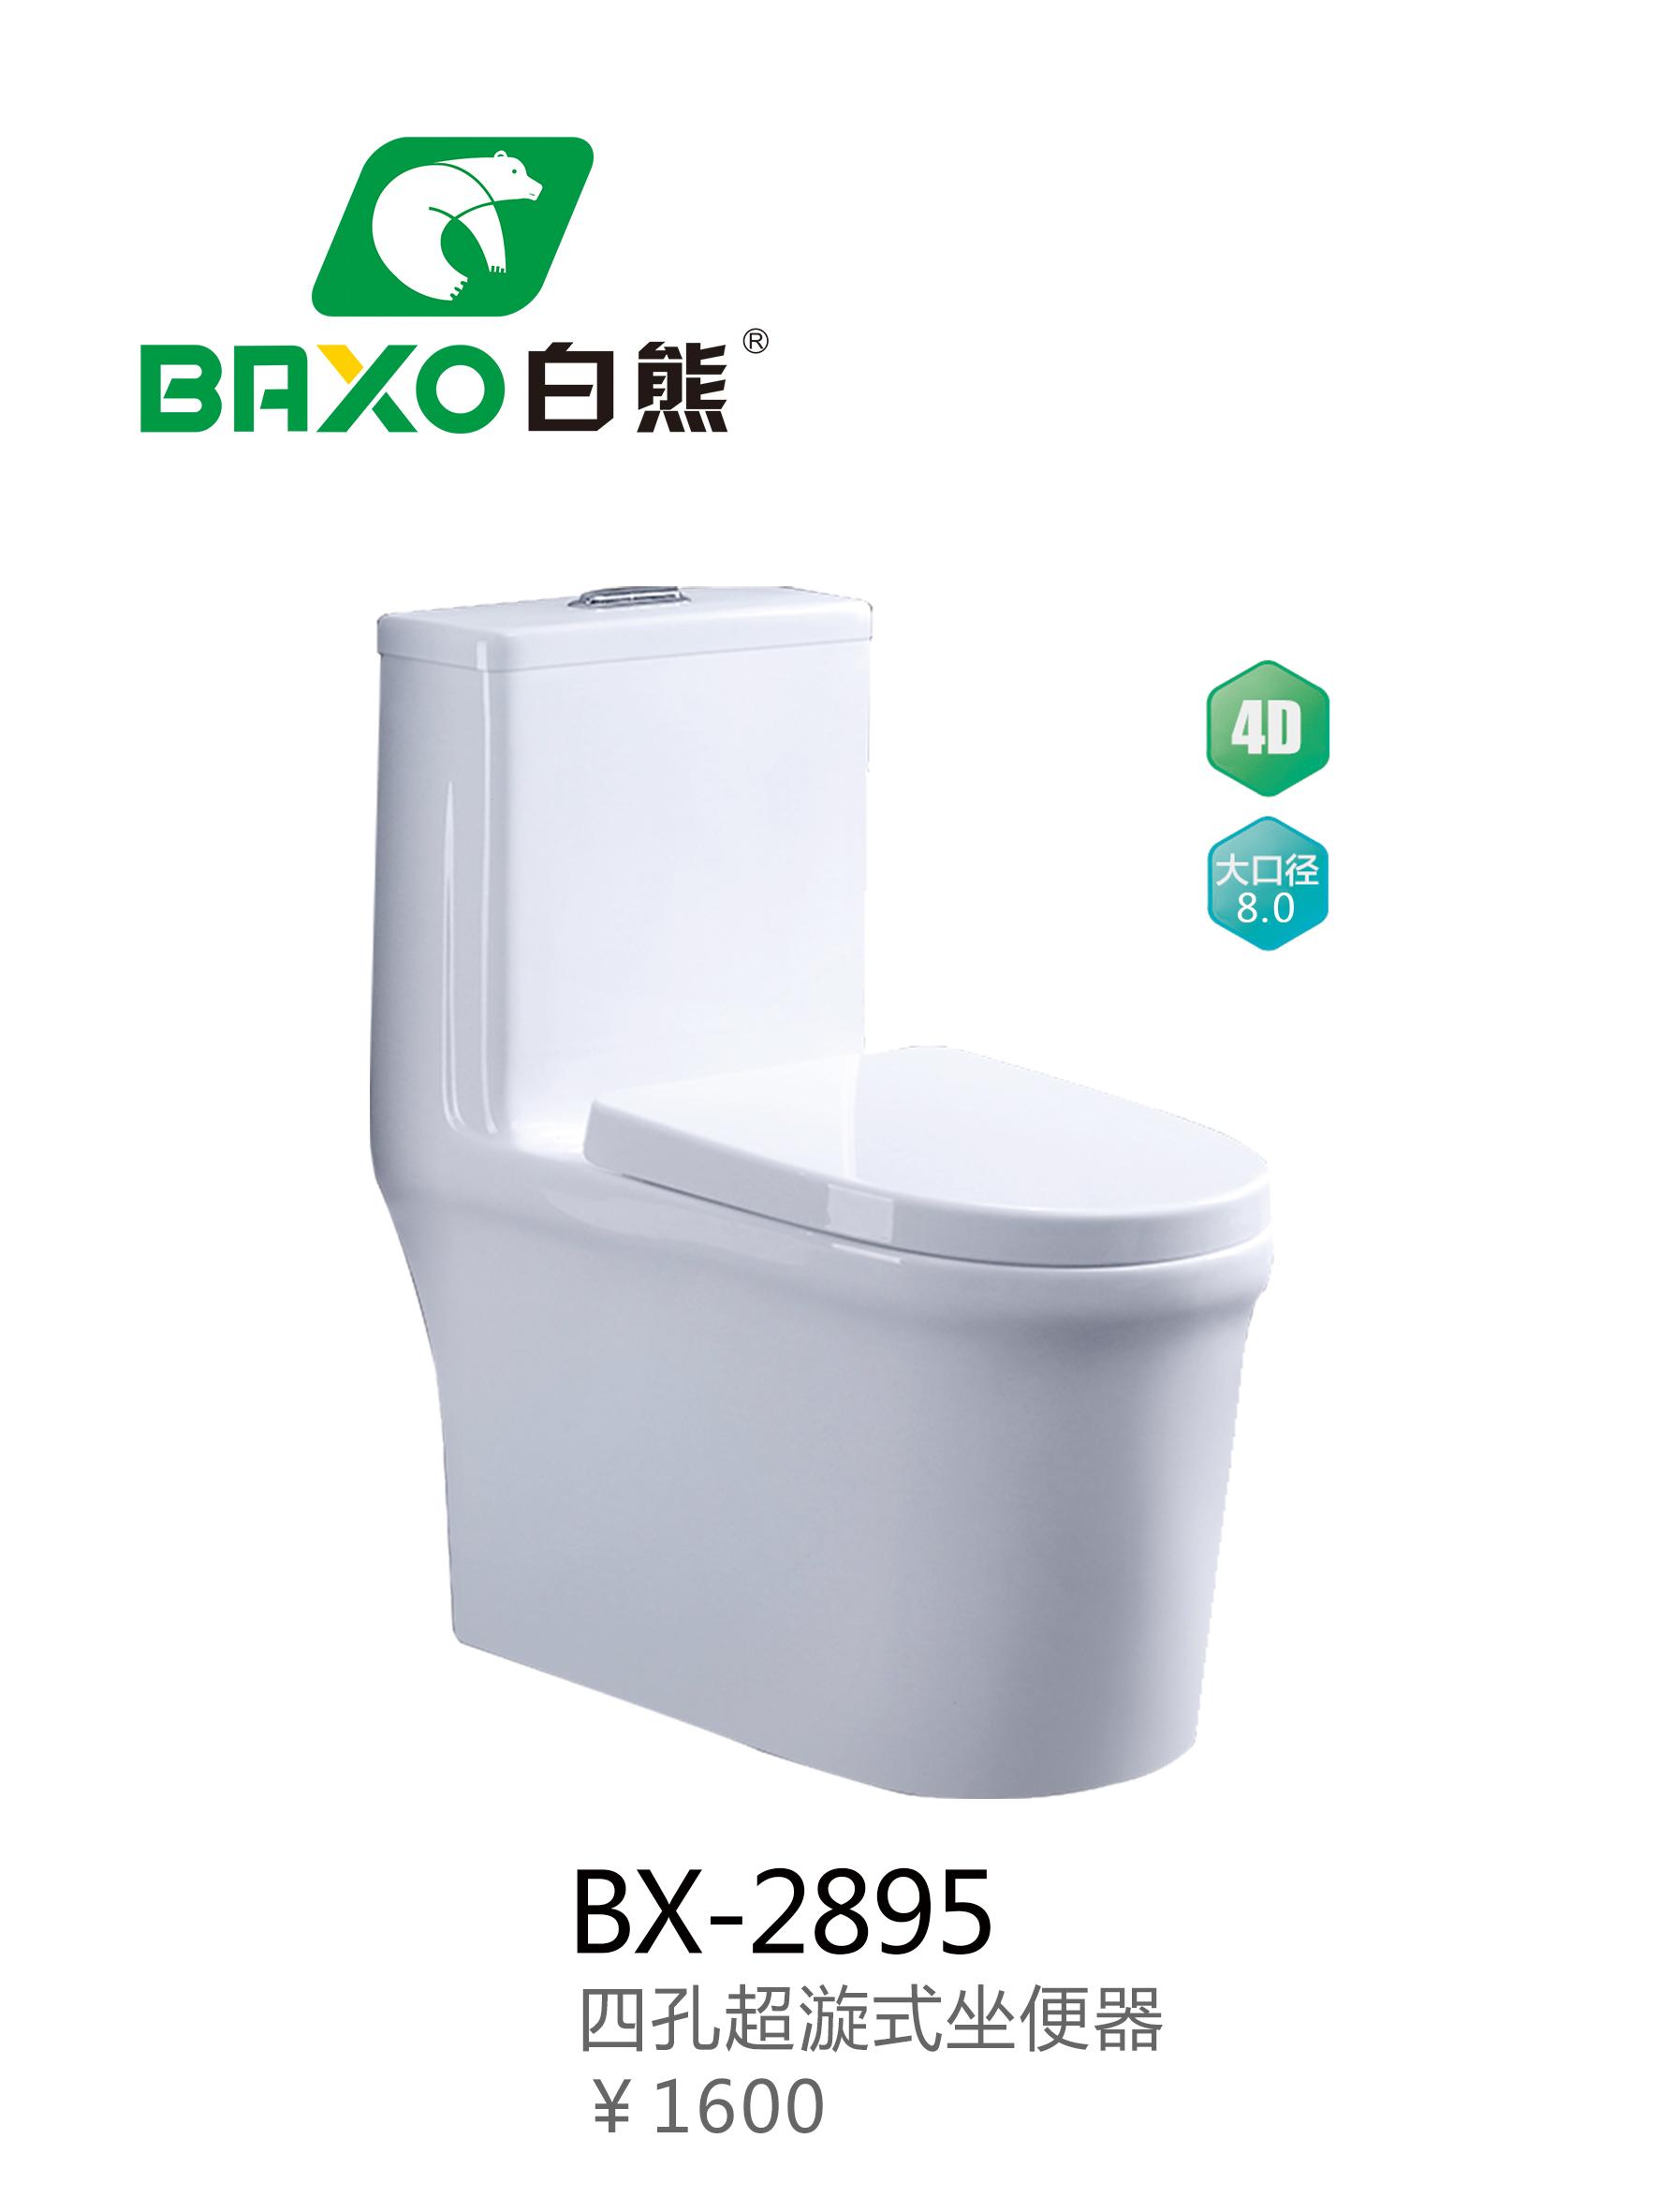 BX-2895四孔超漩坐便器